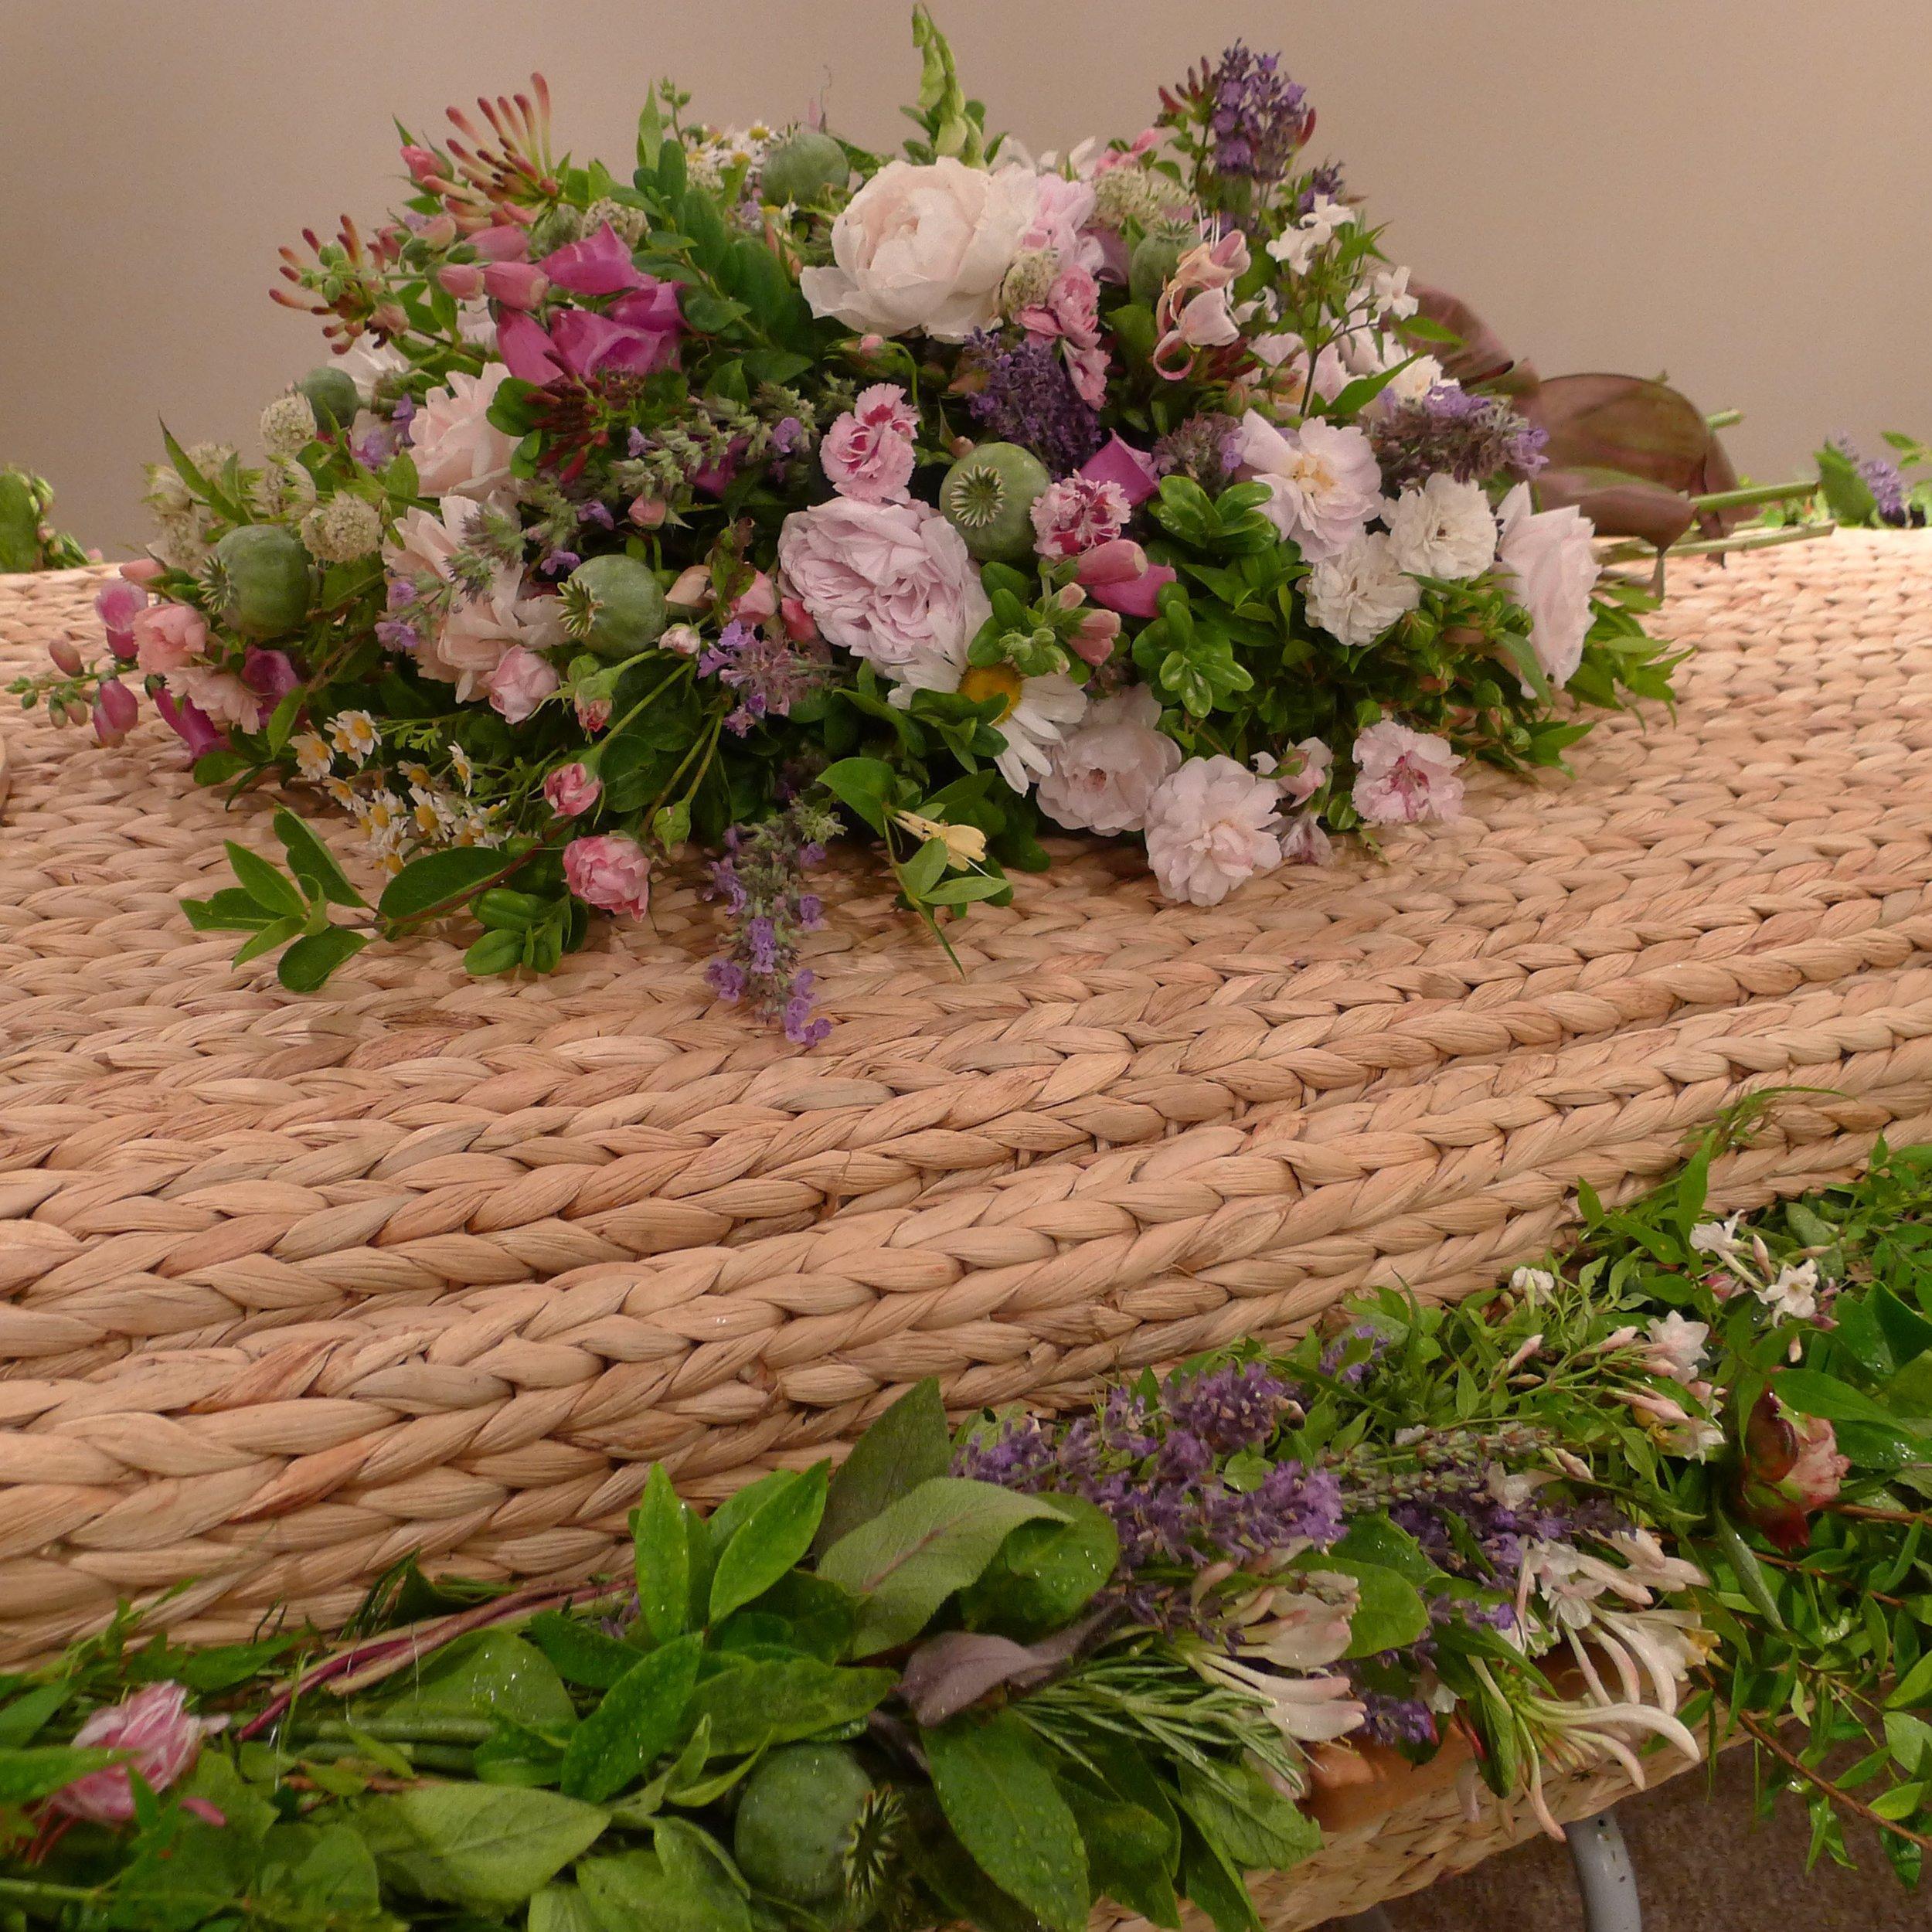 sympathy-green-coffin.jpg